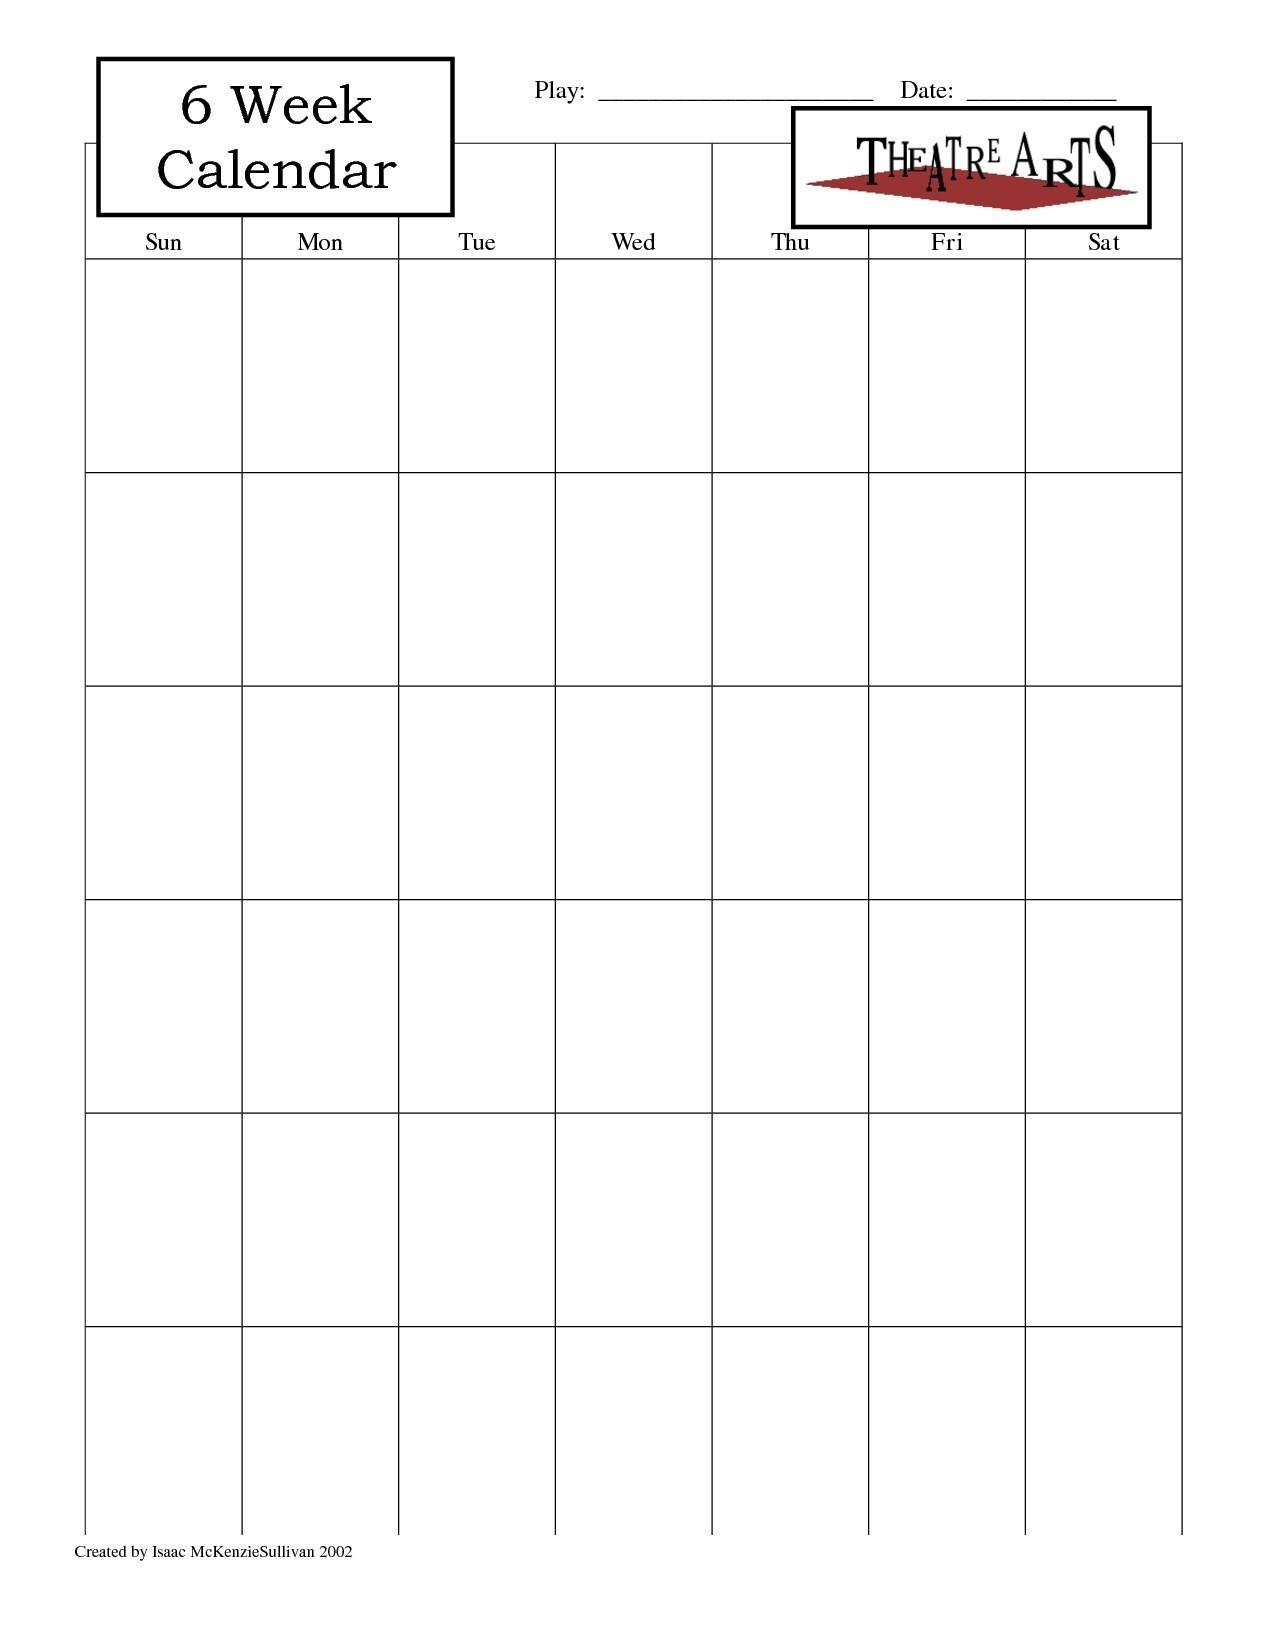 Blank 6 Week Calendar Template With Weeks 25971 Also On 6 Week in Blank 6 Week Calendar Template